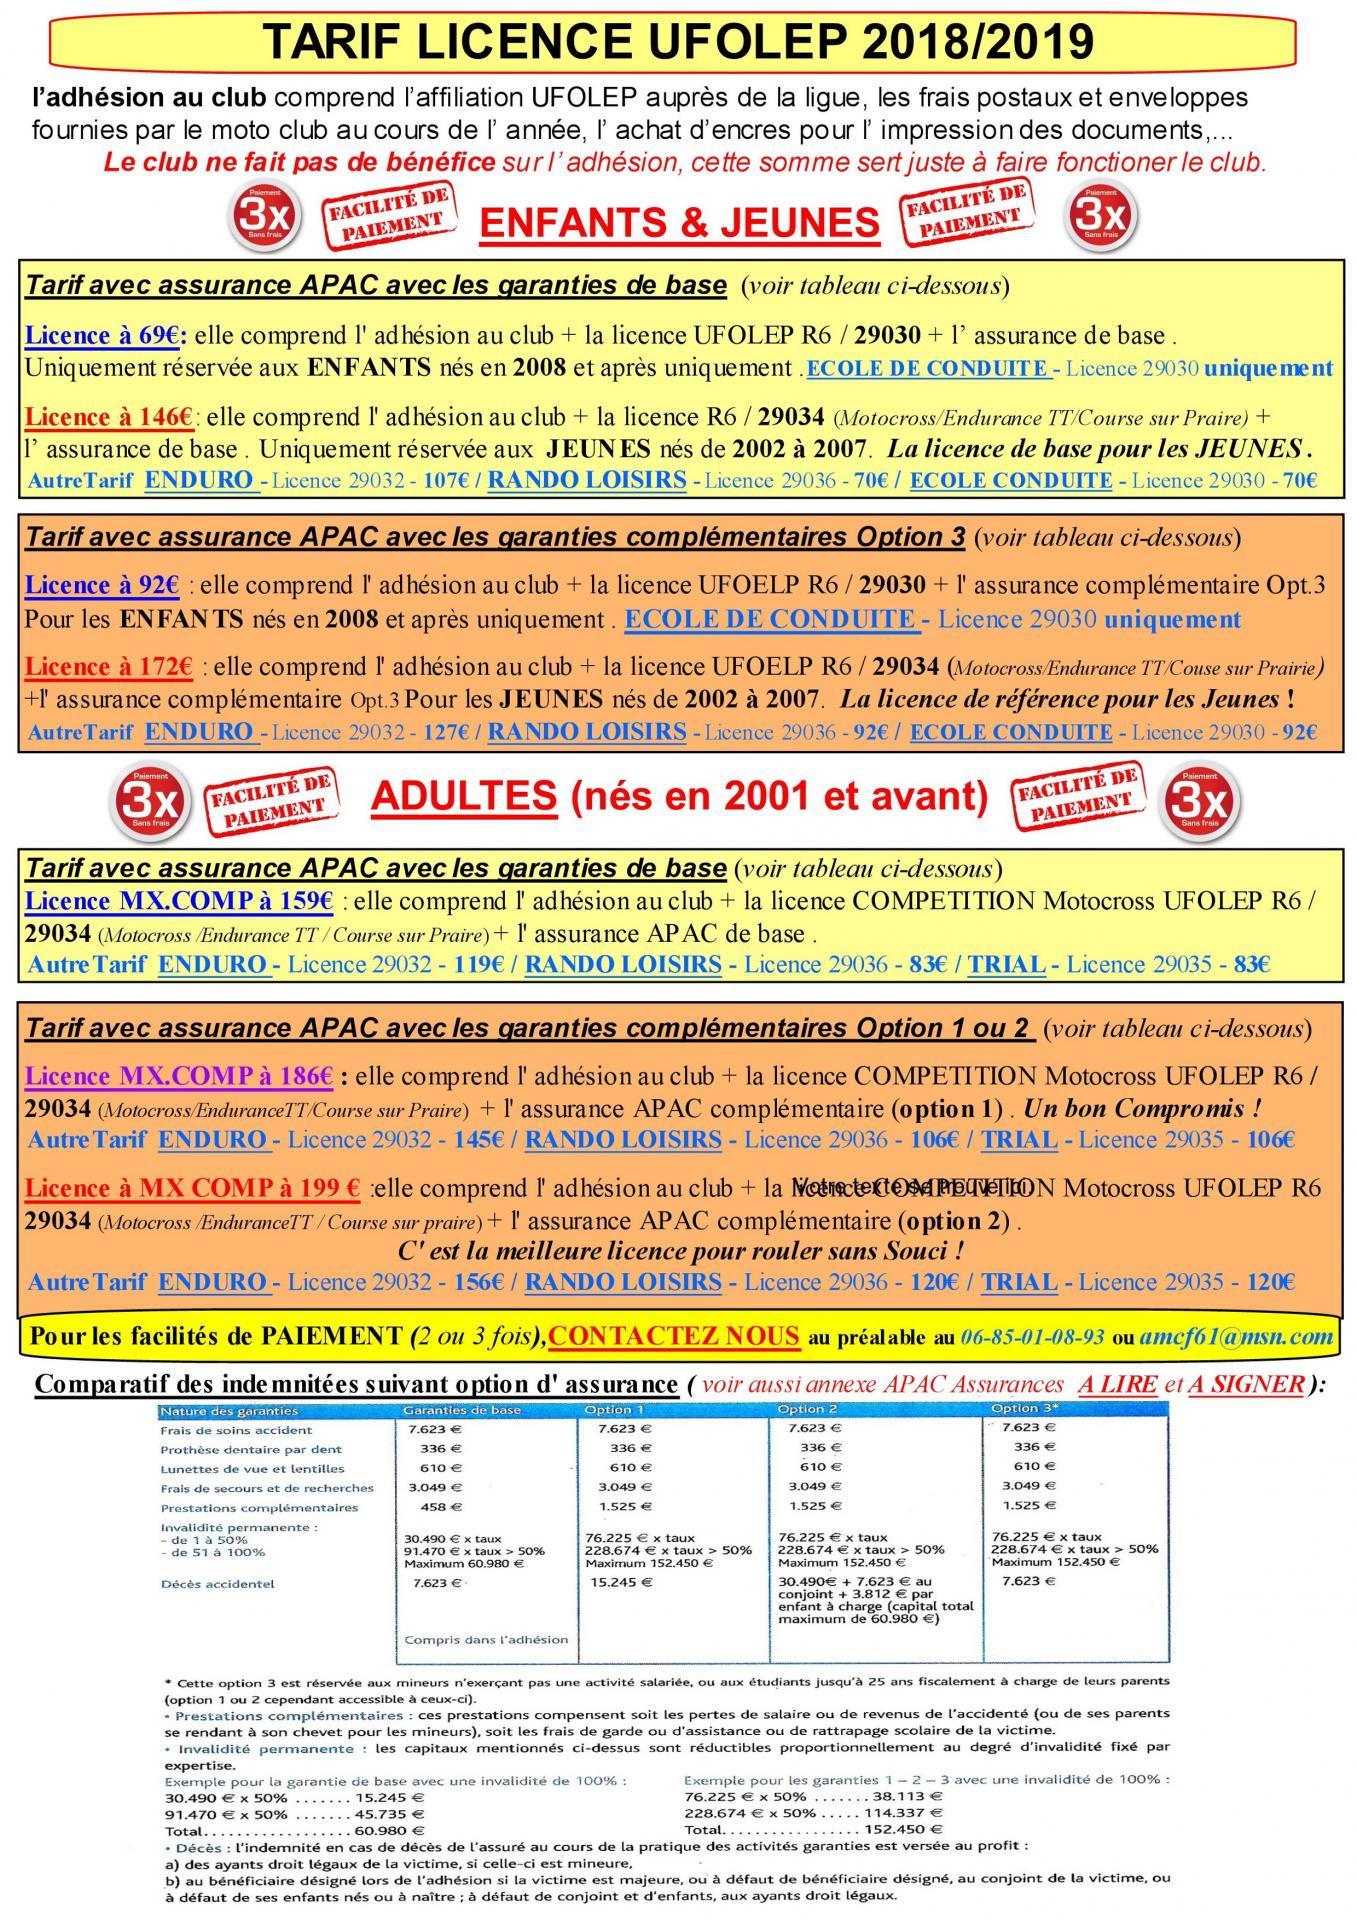 Tarif licence 2018/2019